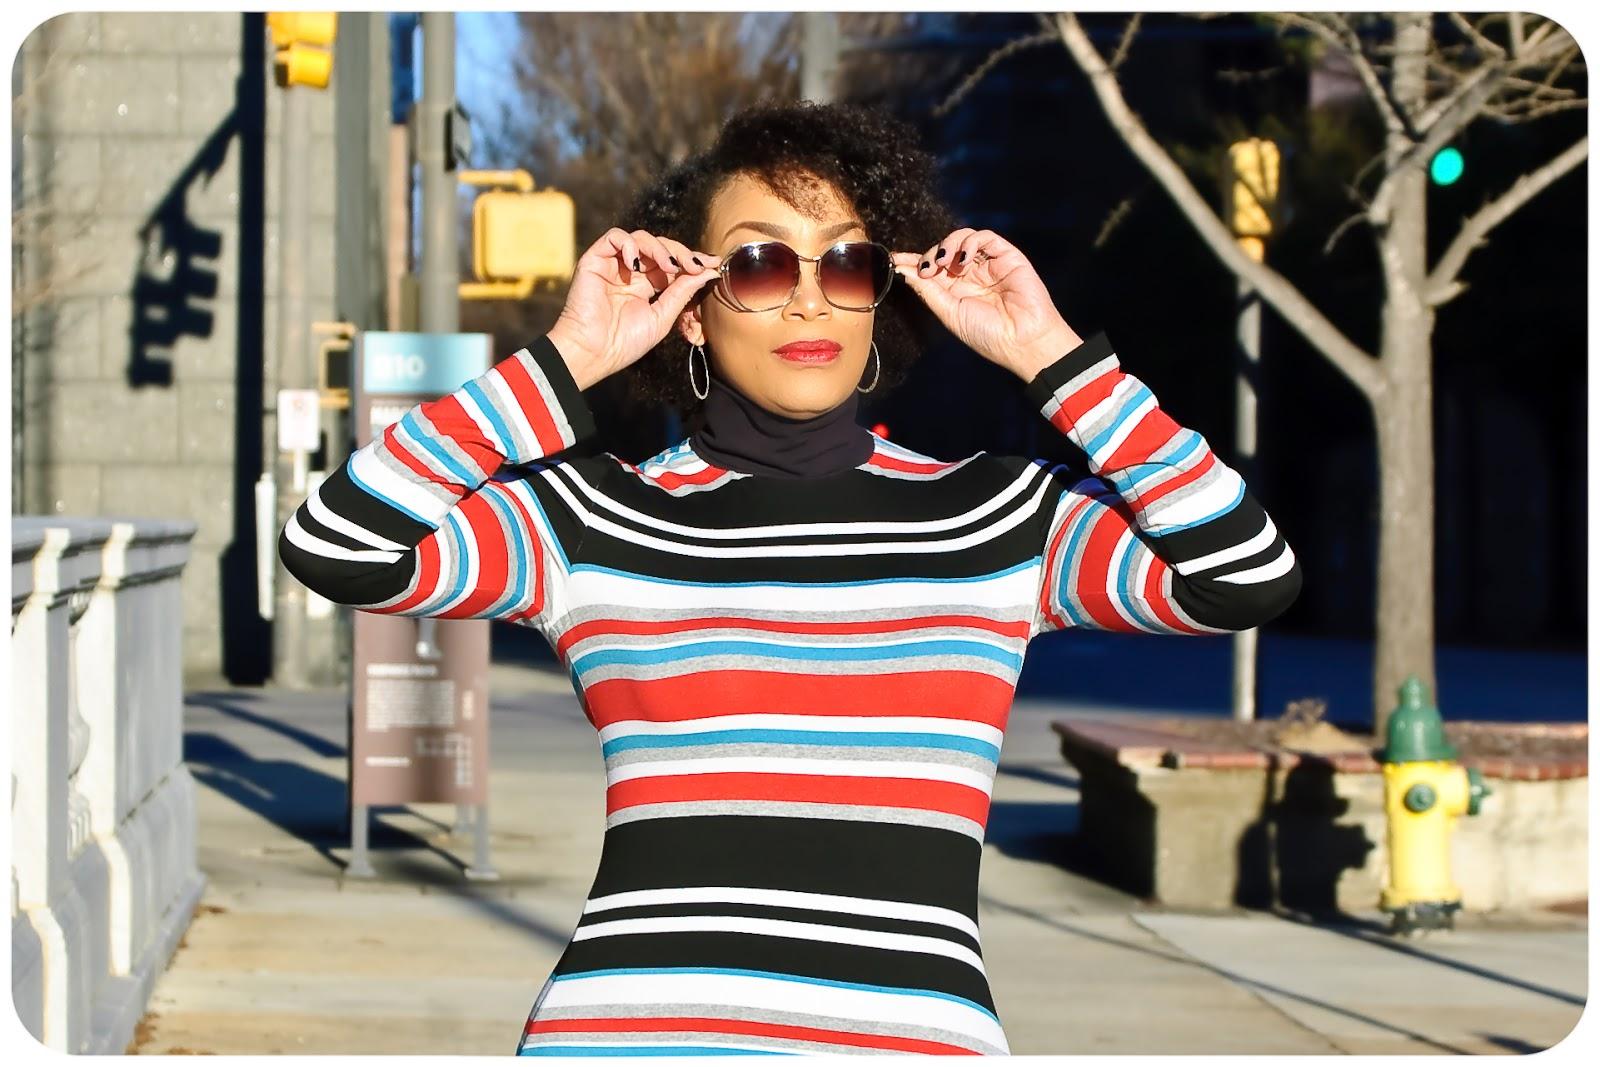 Vogue 8939 - Turtleneck Striped Midi Dress! Erica Bunker DIY Style